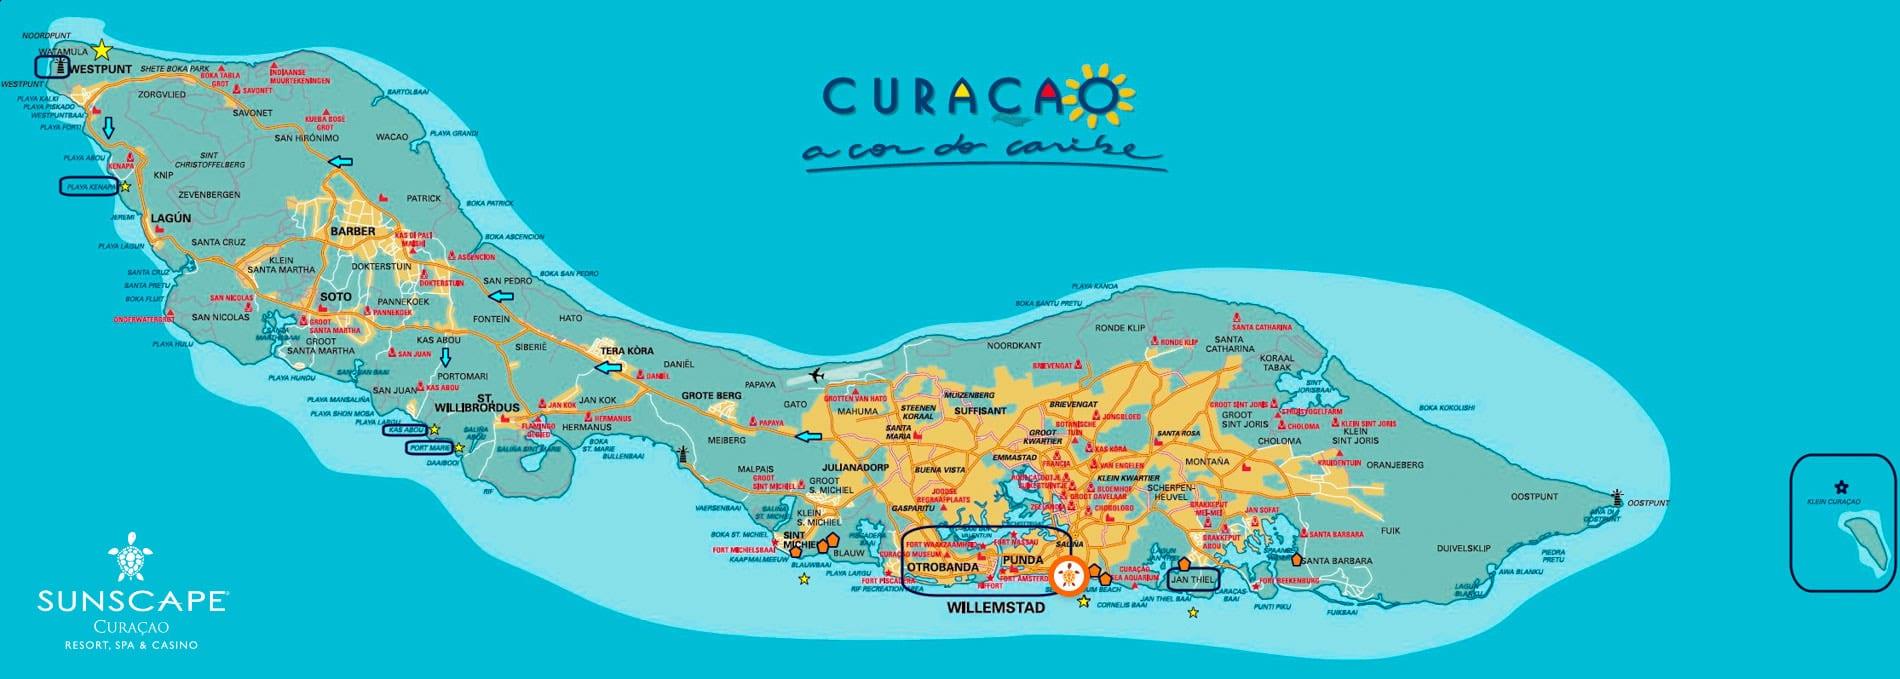 Mapa Sunscape Curaçao